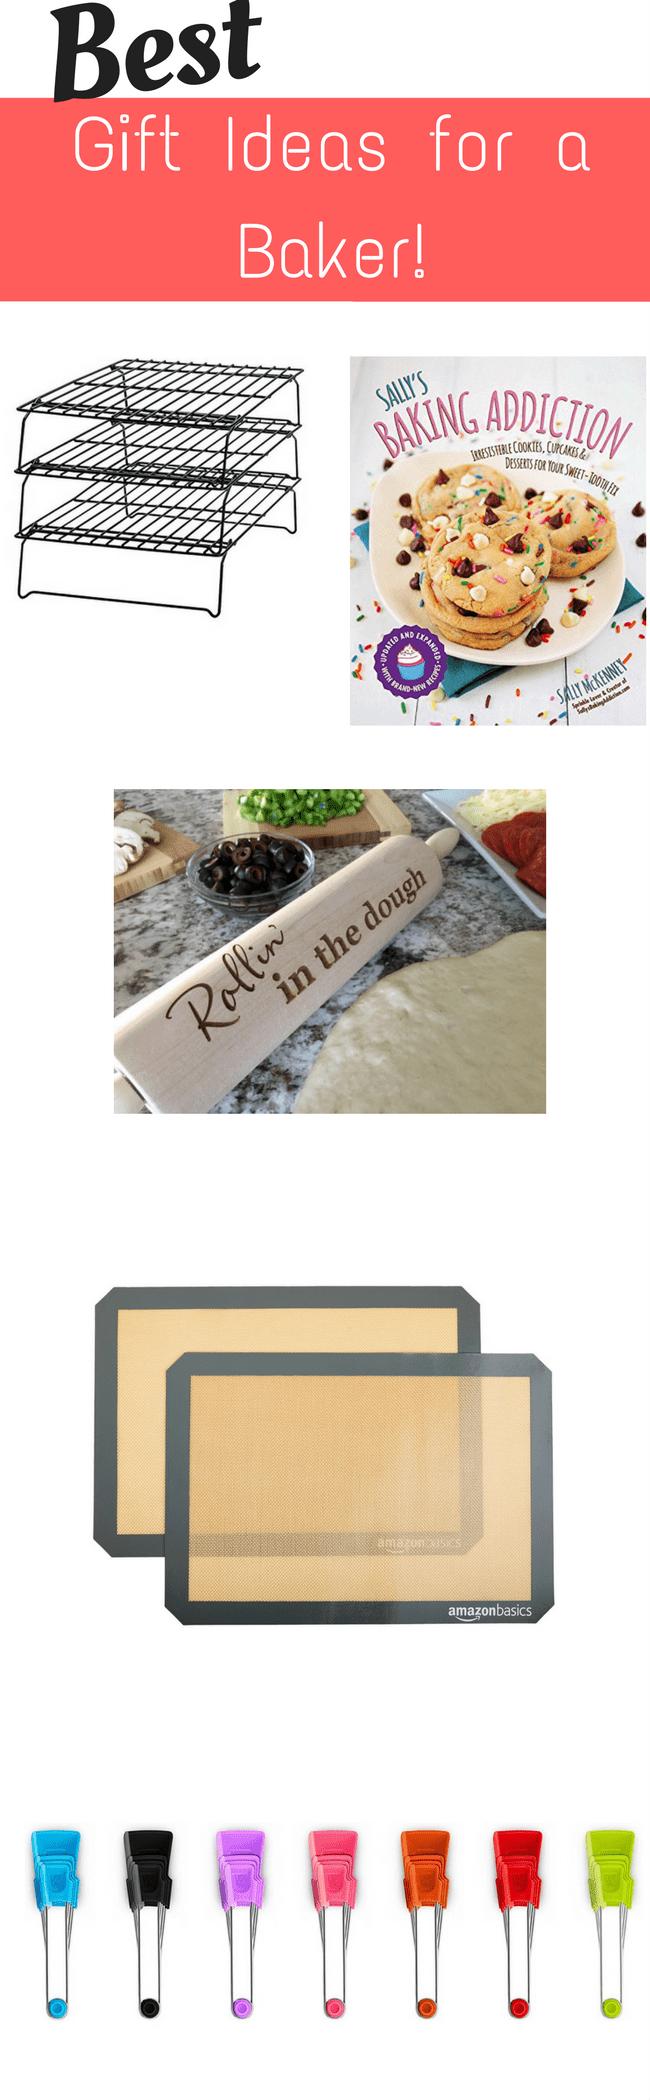 The best gift ideas for a baker.  via @clarkscondensed